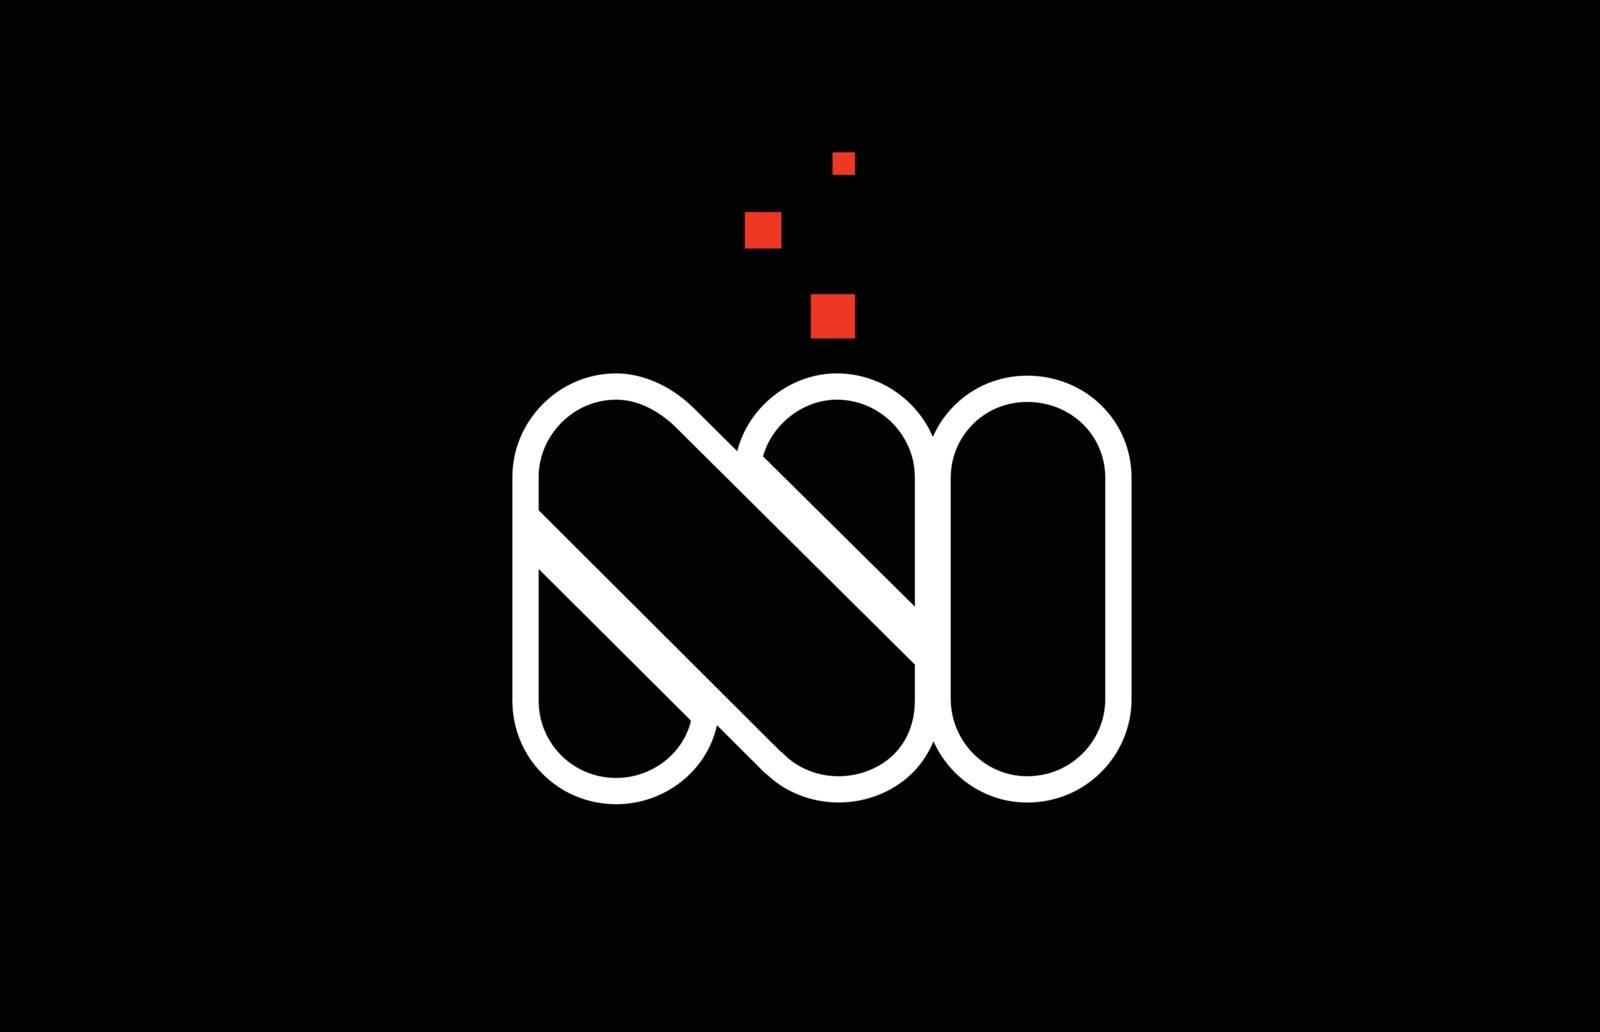 NI N I black white red alphabet letter combination logo icon des by dragomirescu